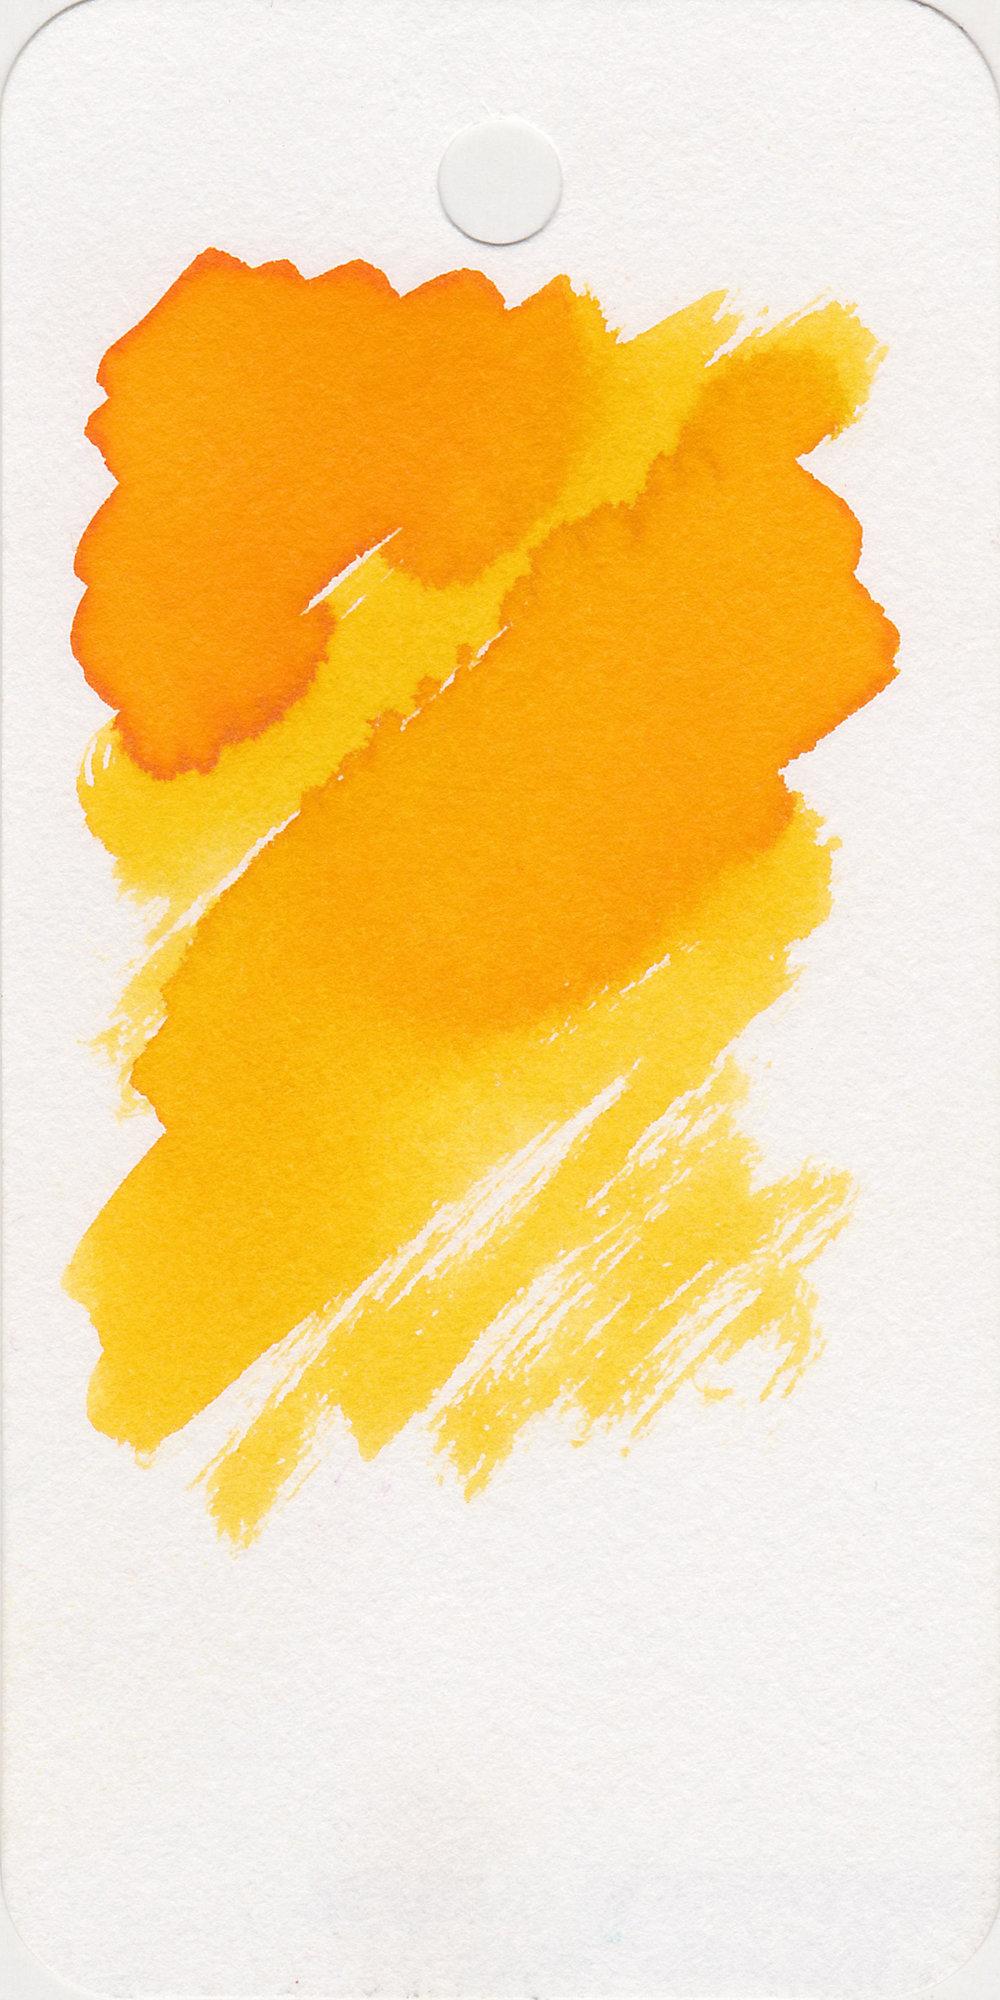 mb-golden-yellow-4.jpg